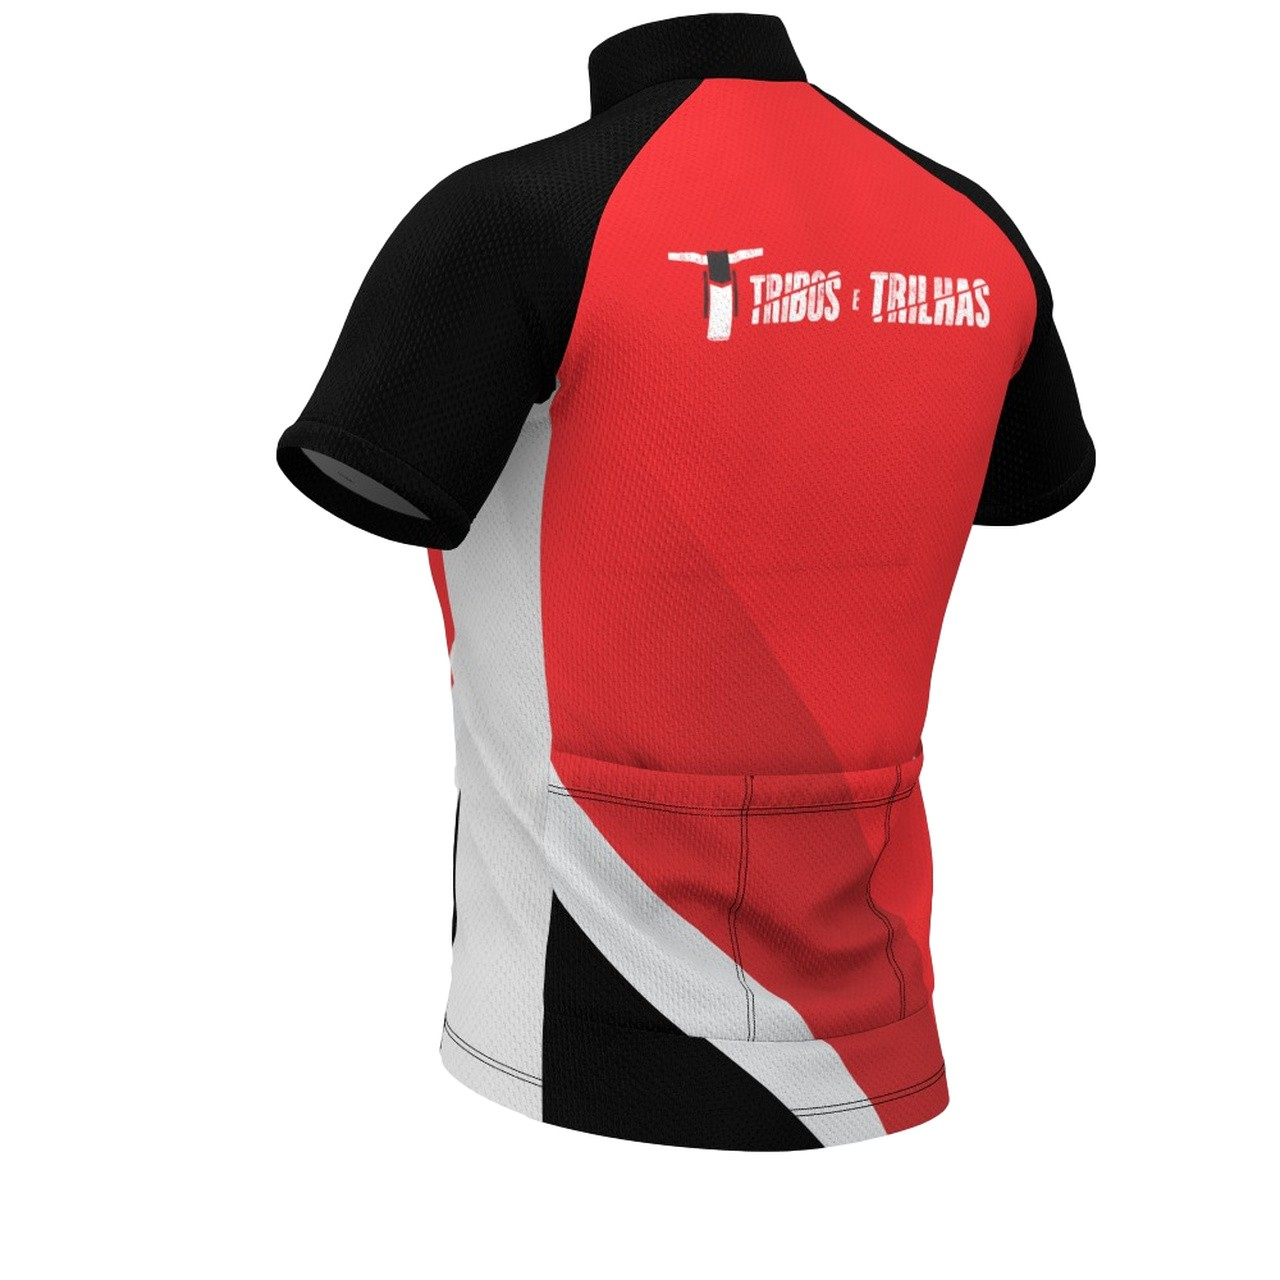 Camisa Bike Tribos e Trilhas Dry Tech Red